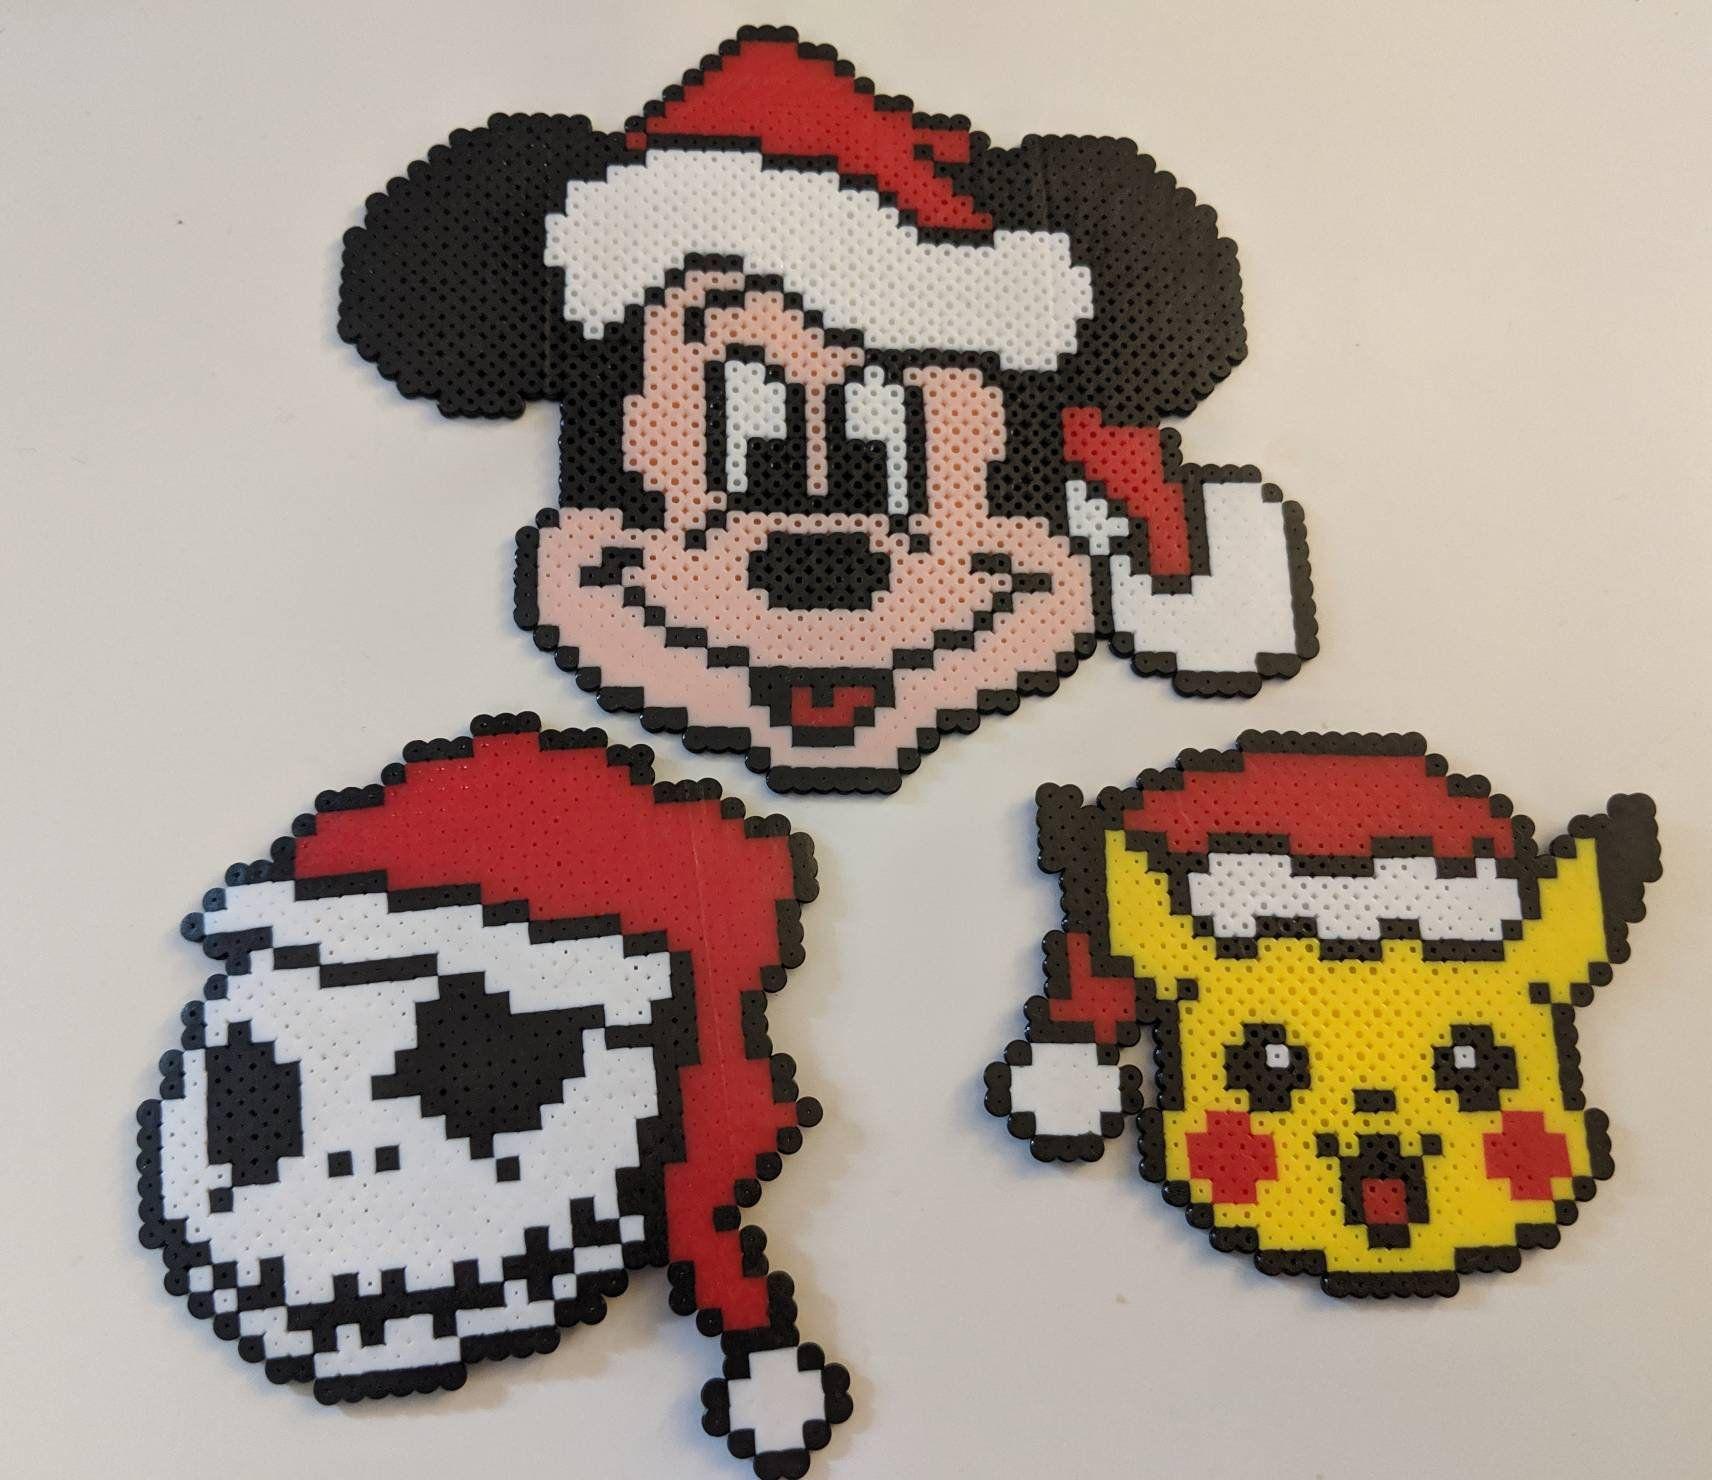 Christmas Decorations Santa Hats Mickey Mouse Pikachu Jack Etsy In 2021 Christmas Perler Beads Perler Bead Disney Perler Bead Art